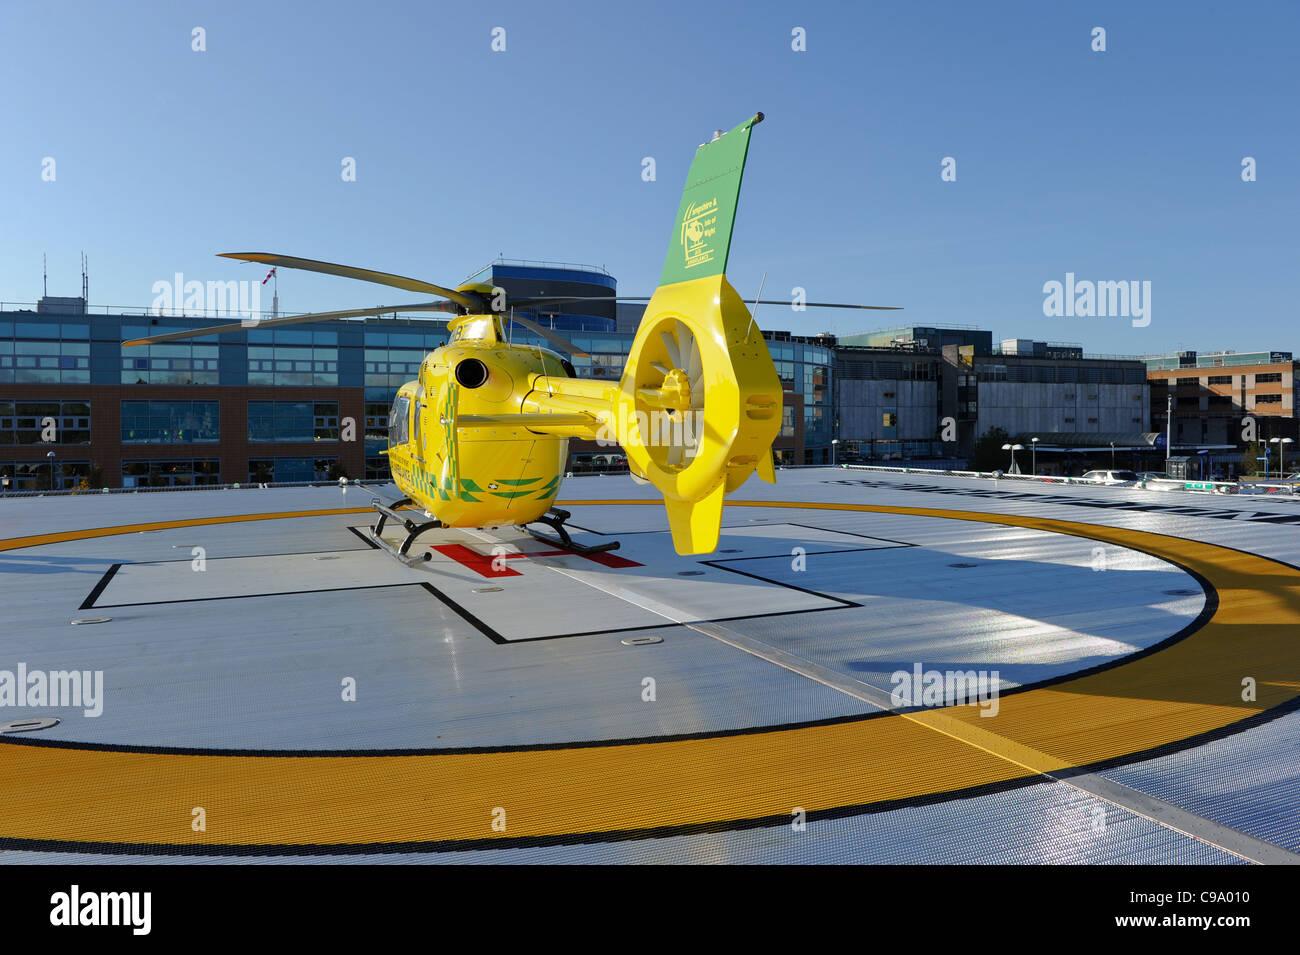 Southampton General hospital helicopter air ambulance landing pad - Stock Image